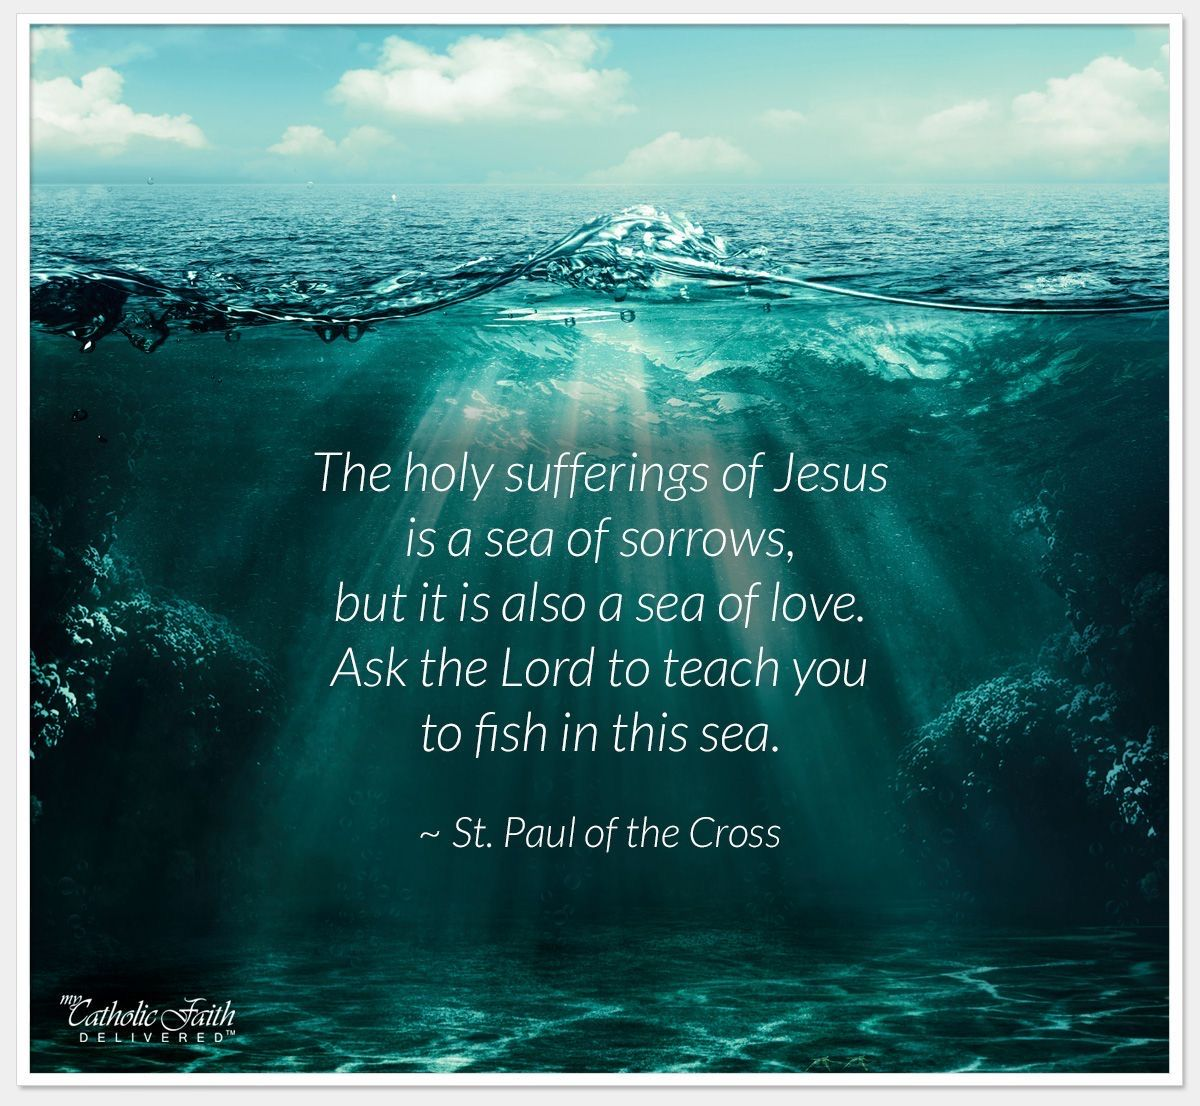 August image by Philomena Lewis Cross quotes, Catholic